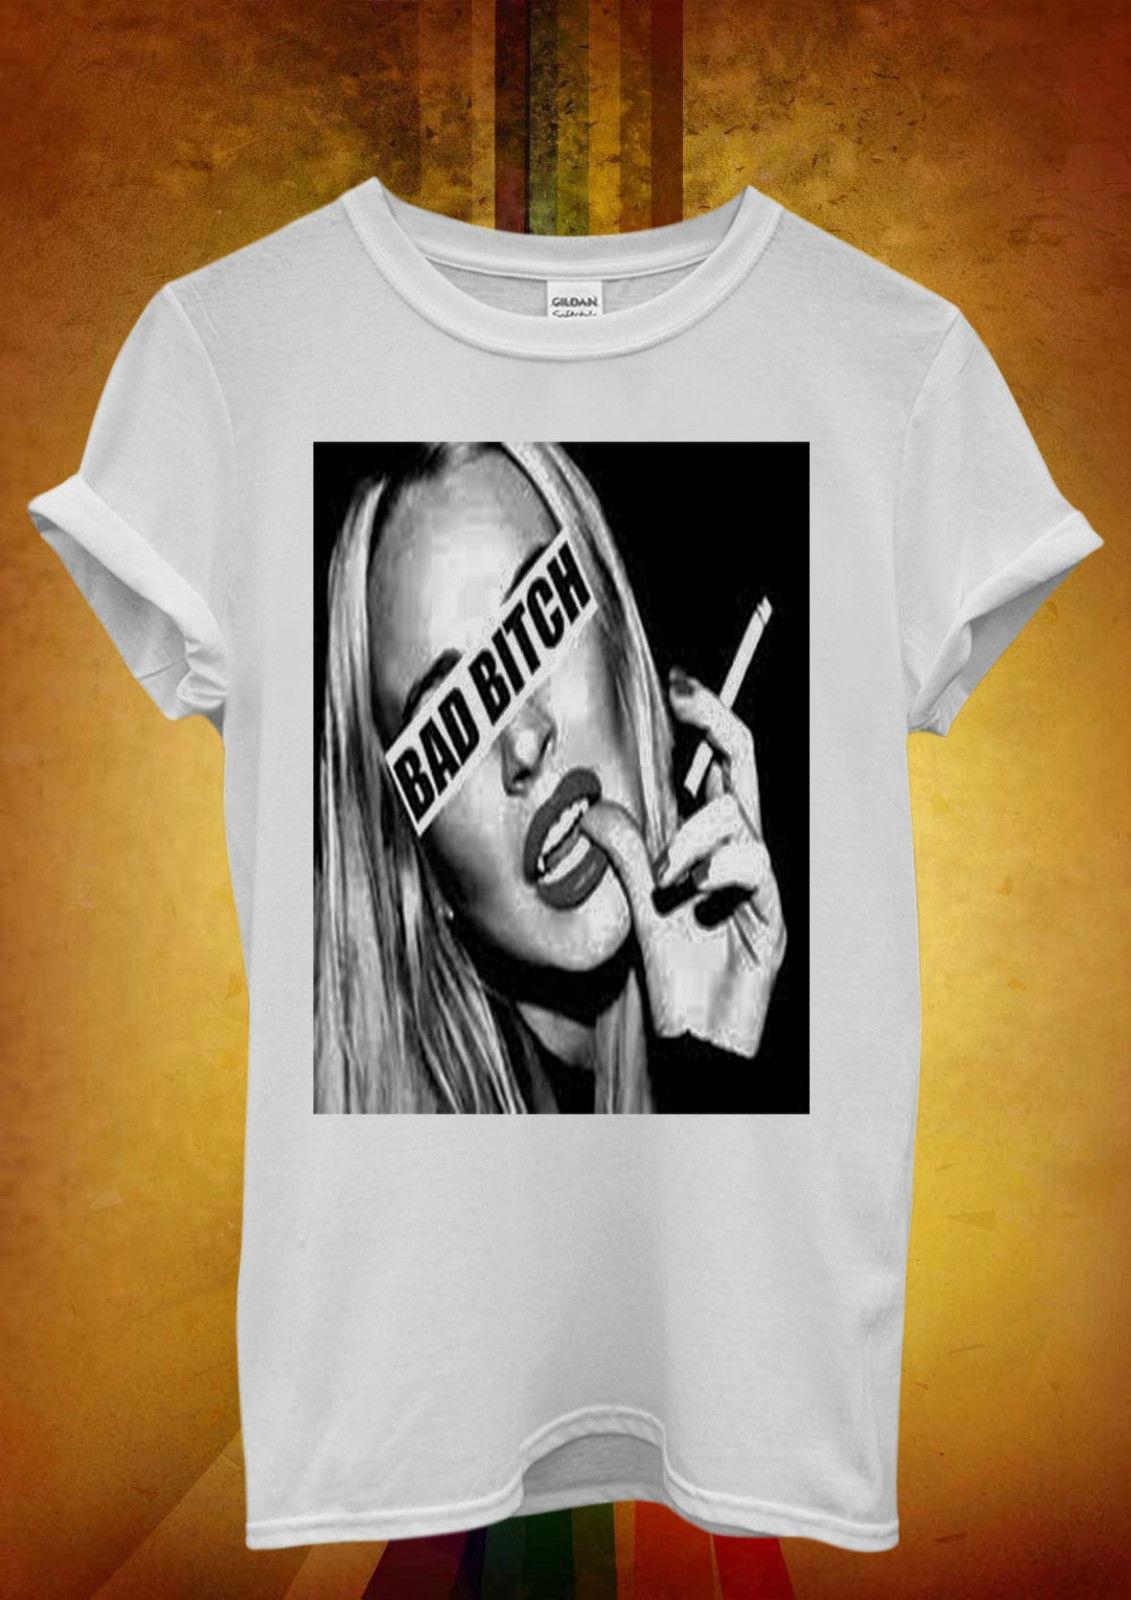 dd83f2fb Bad Bitch Sexy Girls Retro Men Women Unisex T Shirt Tank Top Vest 348  Hoodie Hip Hop T Shirt Tees Custom Jersey T Shirt Shirt And Tshirt Create  Your Own T ...